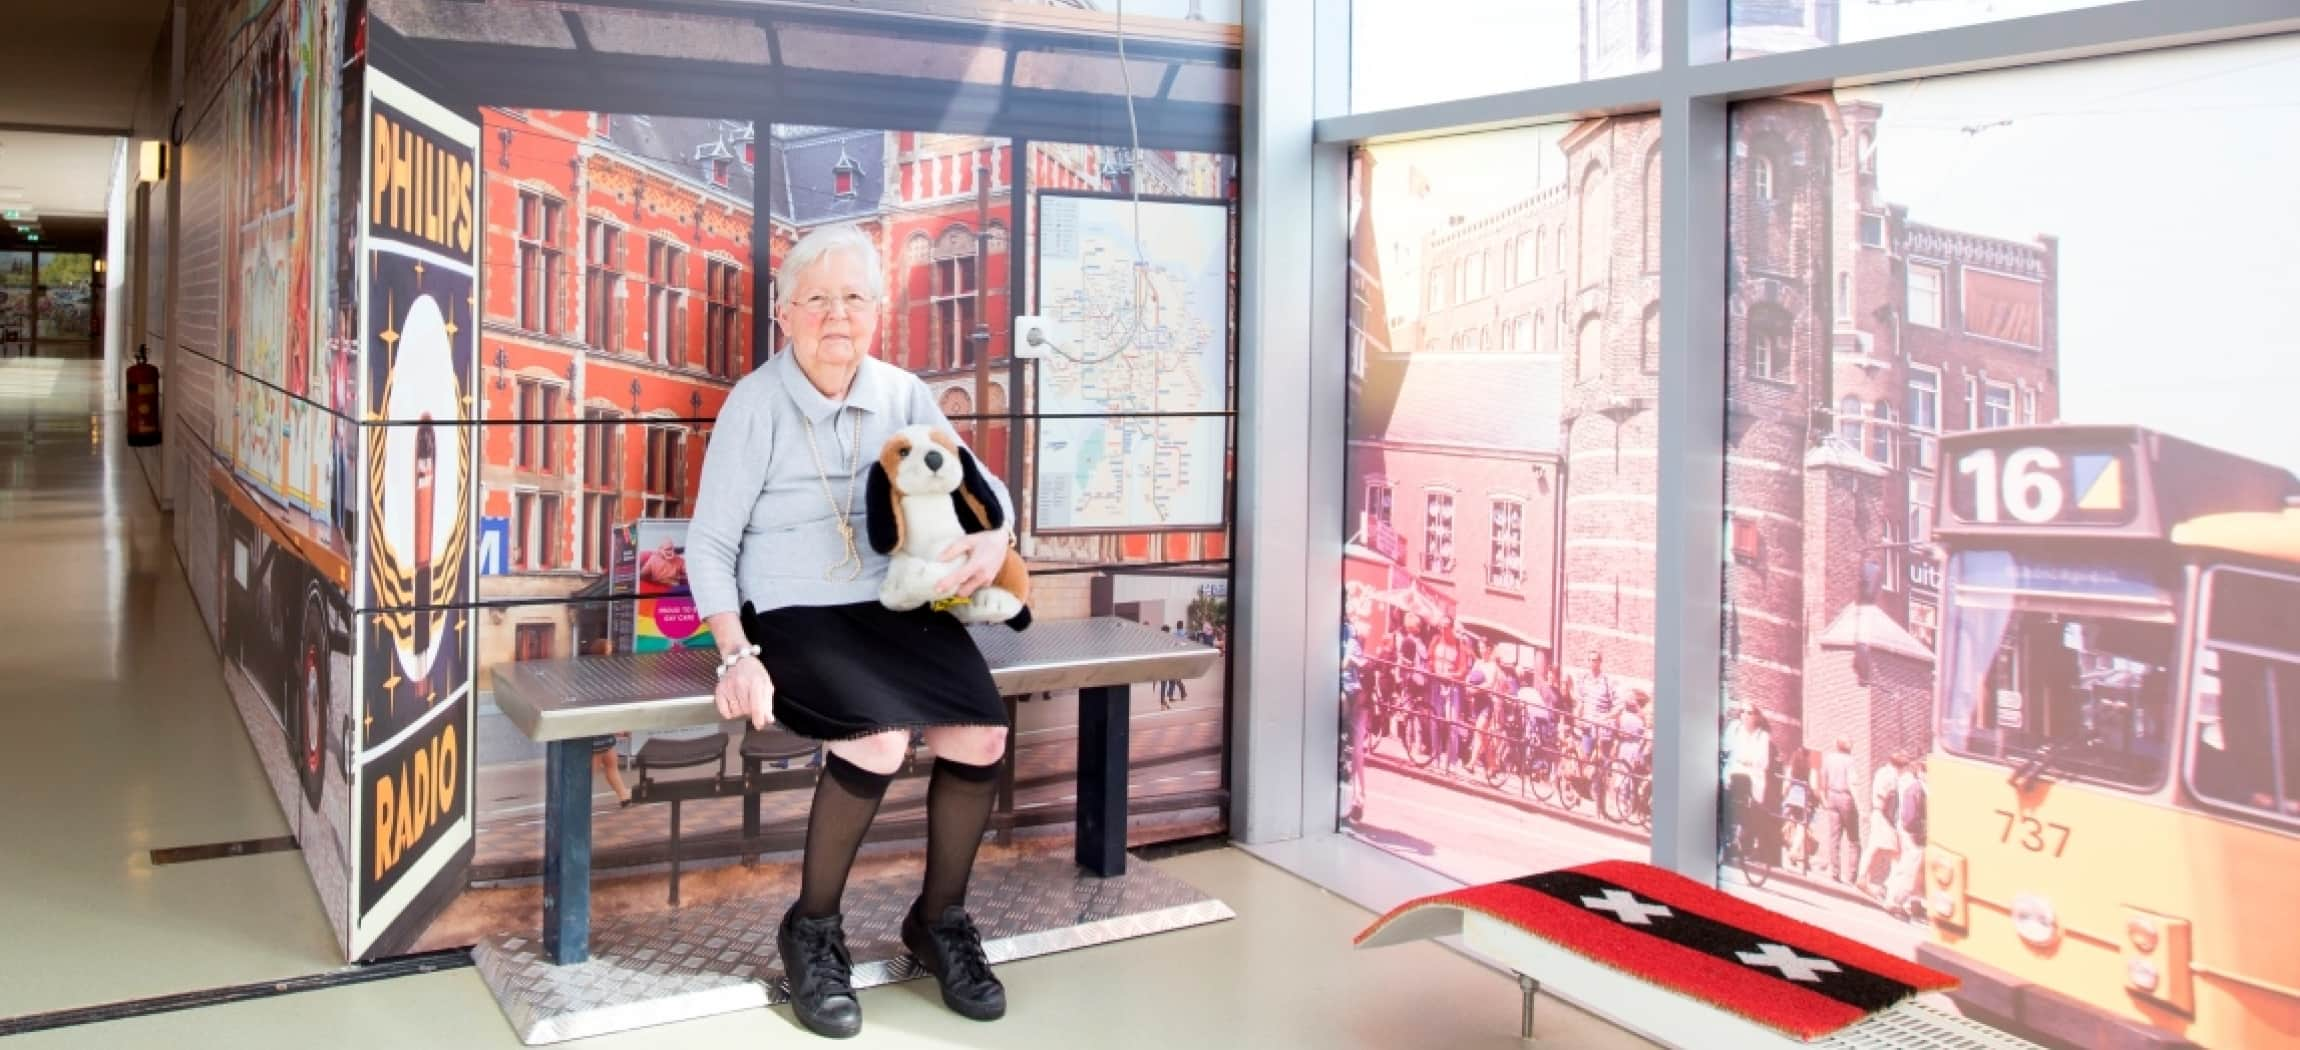 Oude dame zit op bankje in reminiscentie belevingsgang dementie verpleeghuis